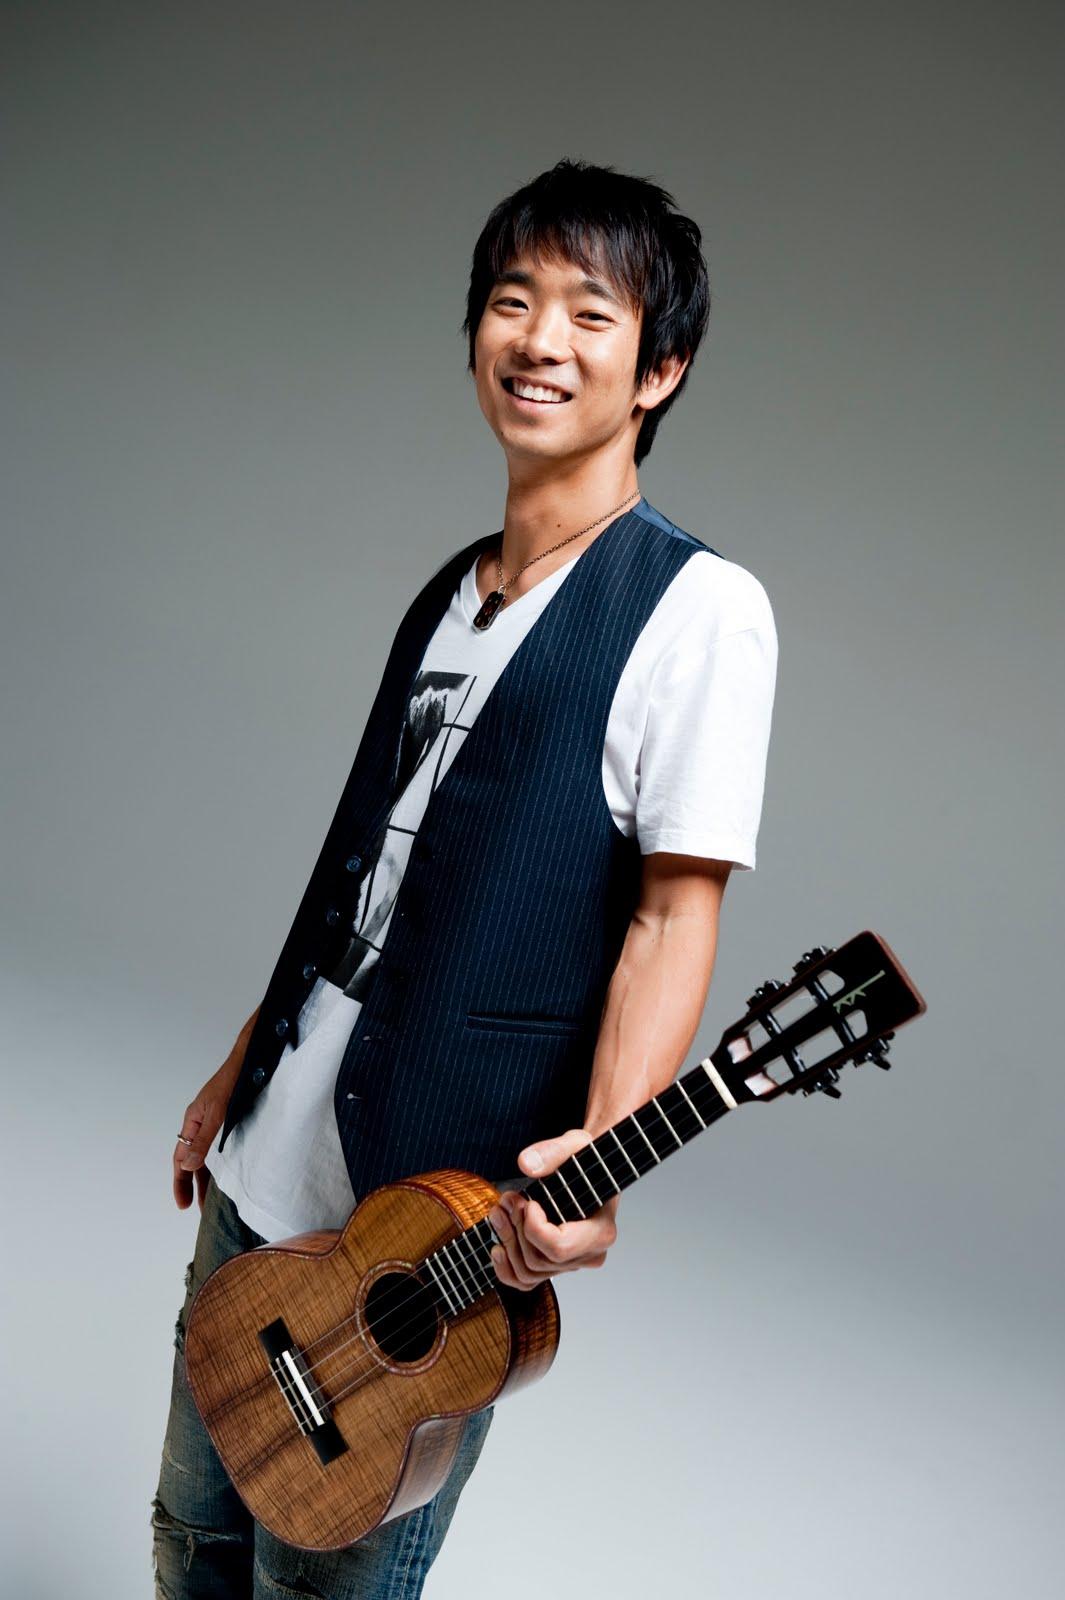 Jake Shimabukuro tested the limits of the ukulele in Kleinhans Music Hall's Mary Seaton Room.